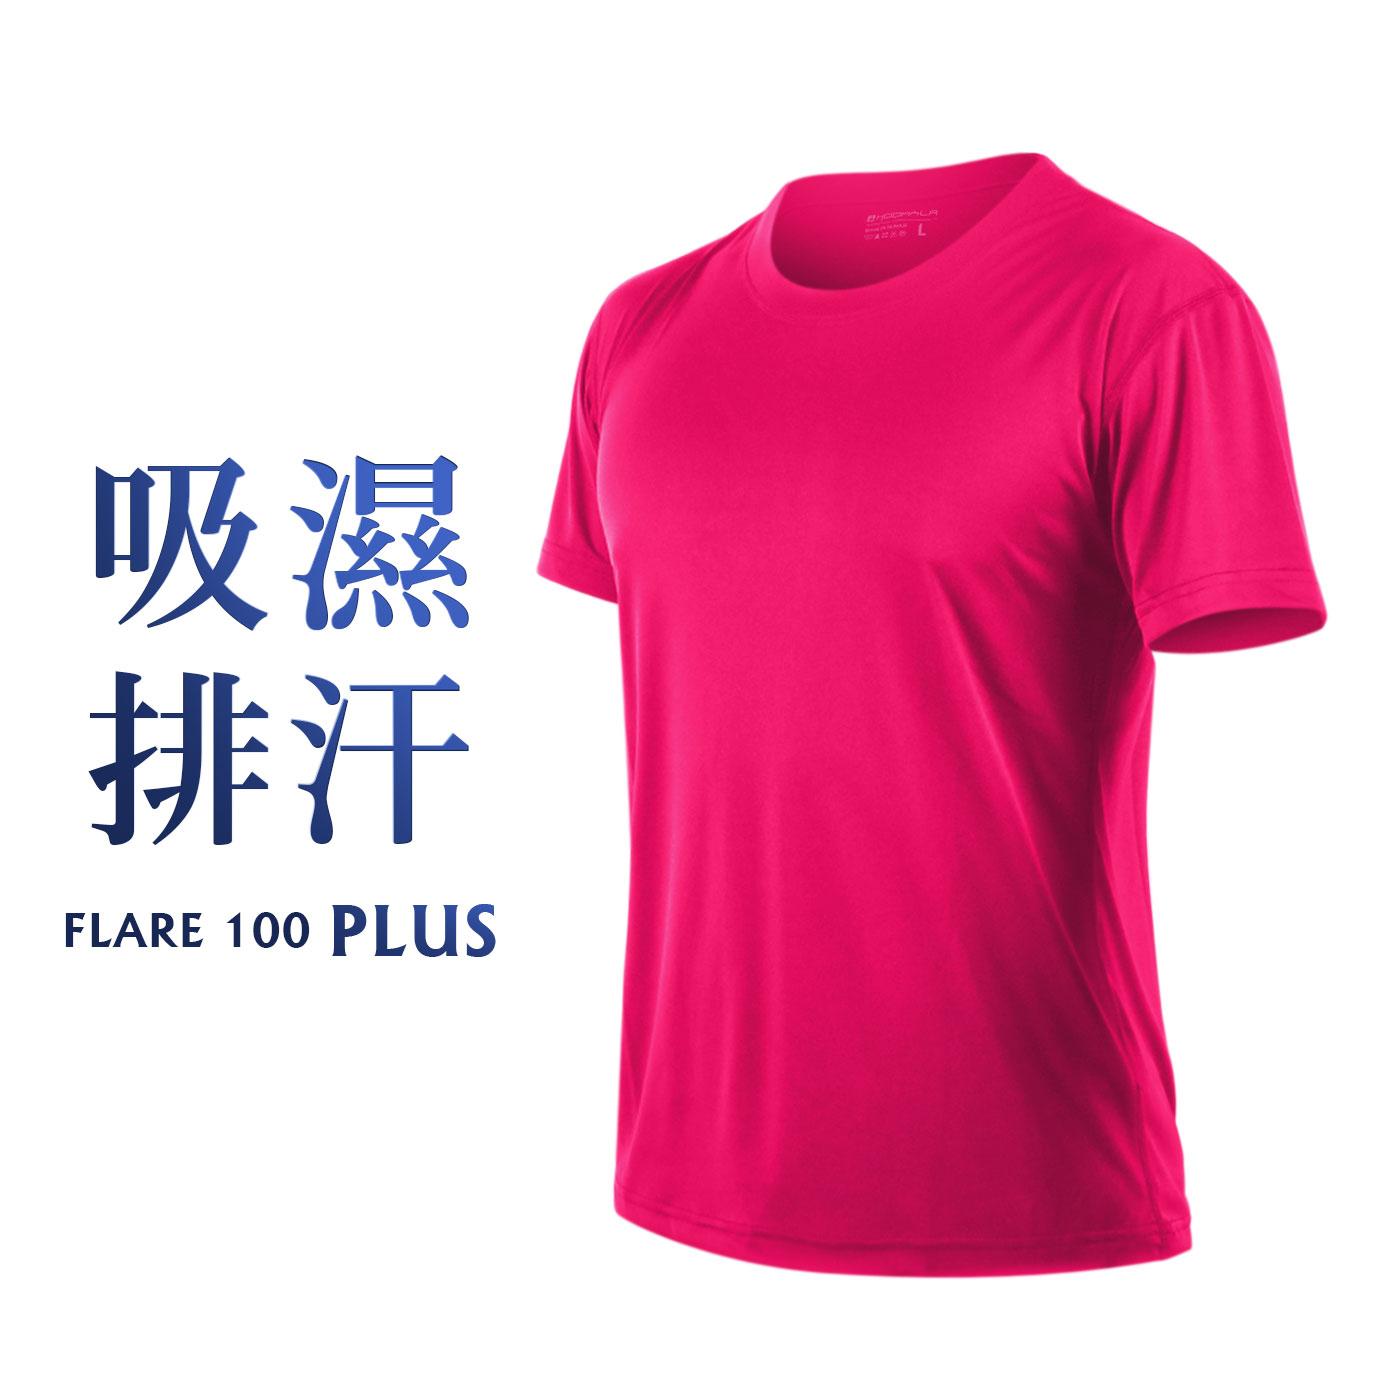 HODARLA FLARE 100 PLUS 吸濕排汗衫 3153701 - 桃紅